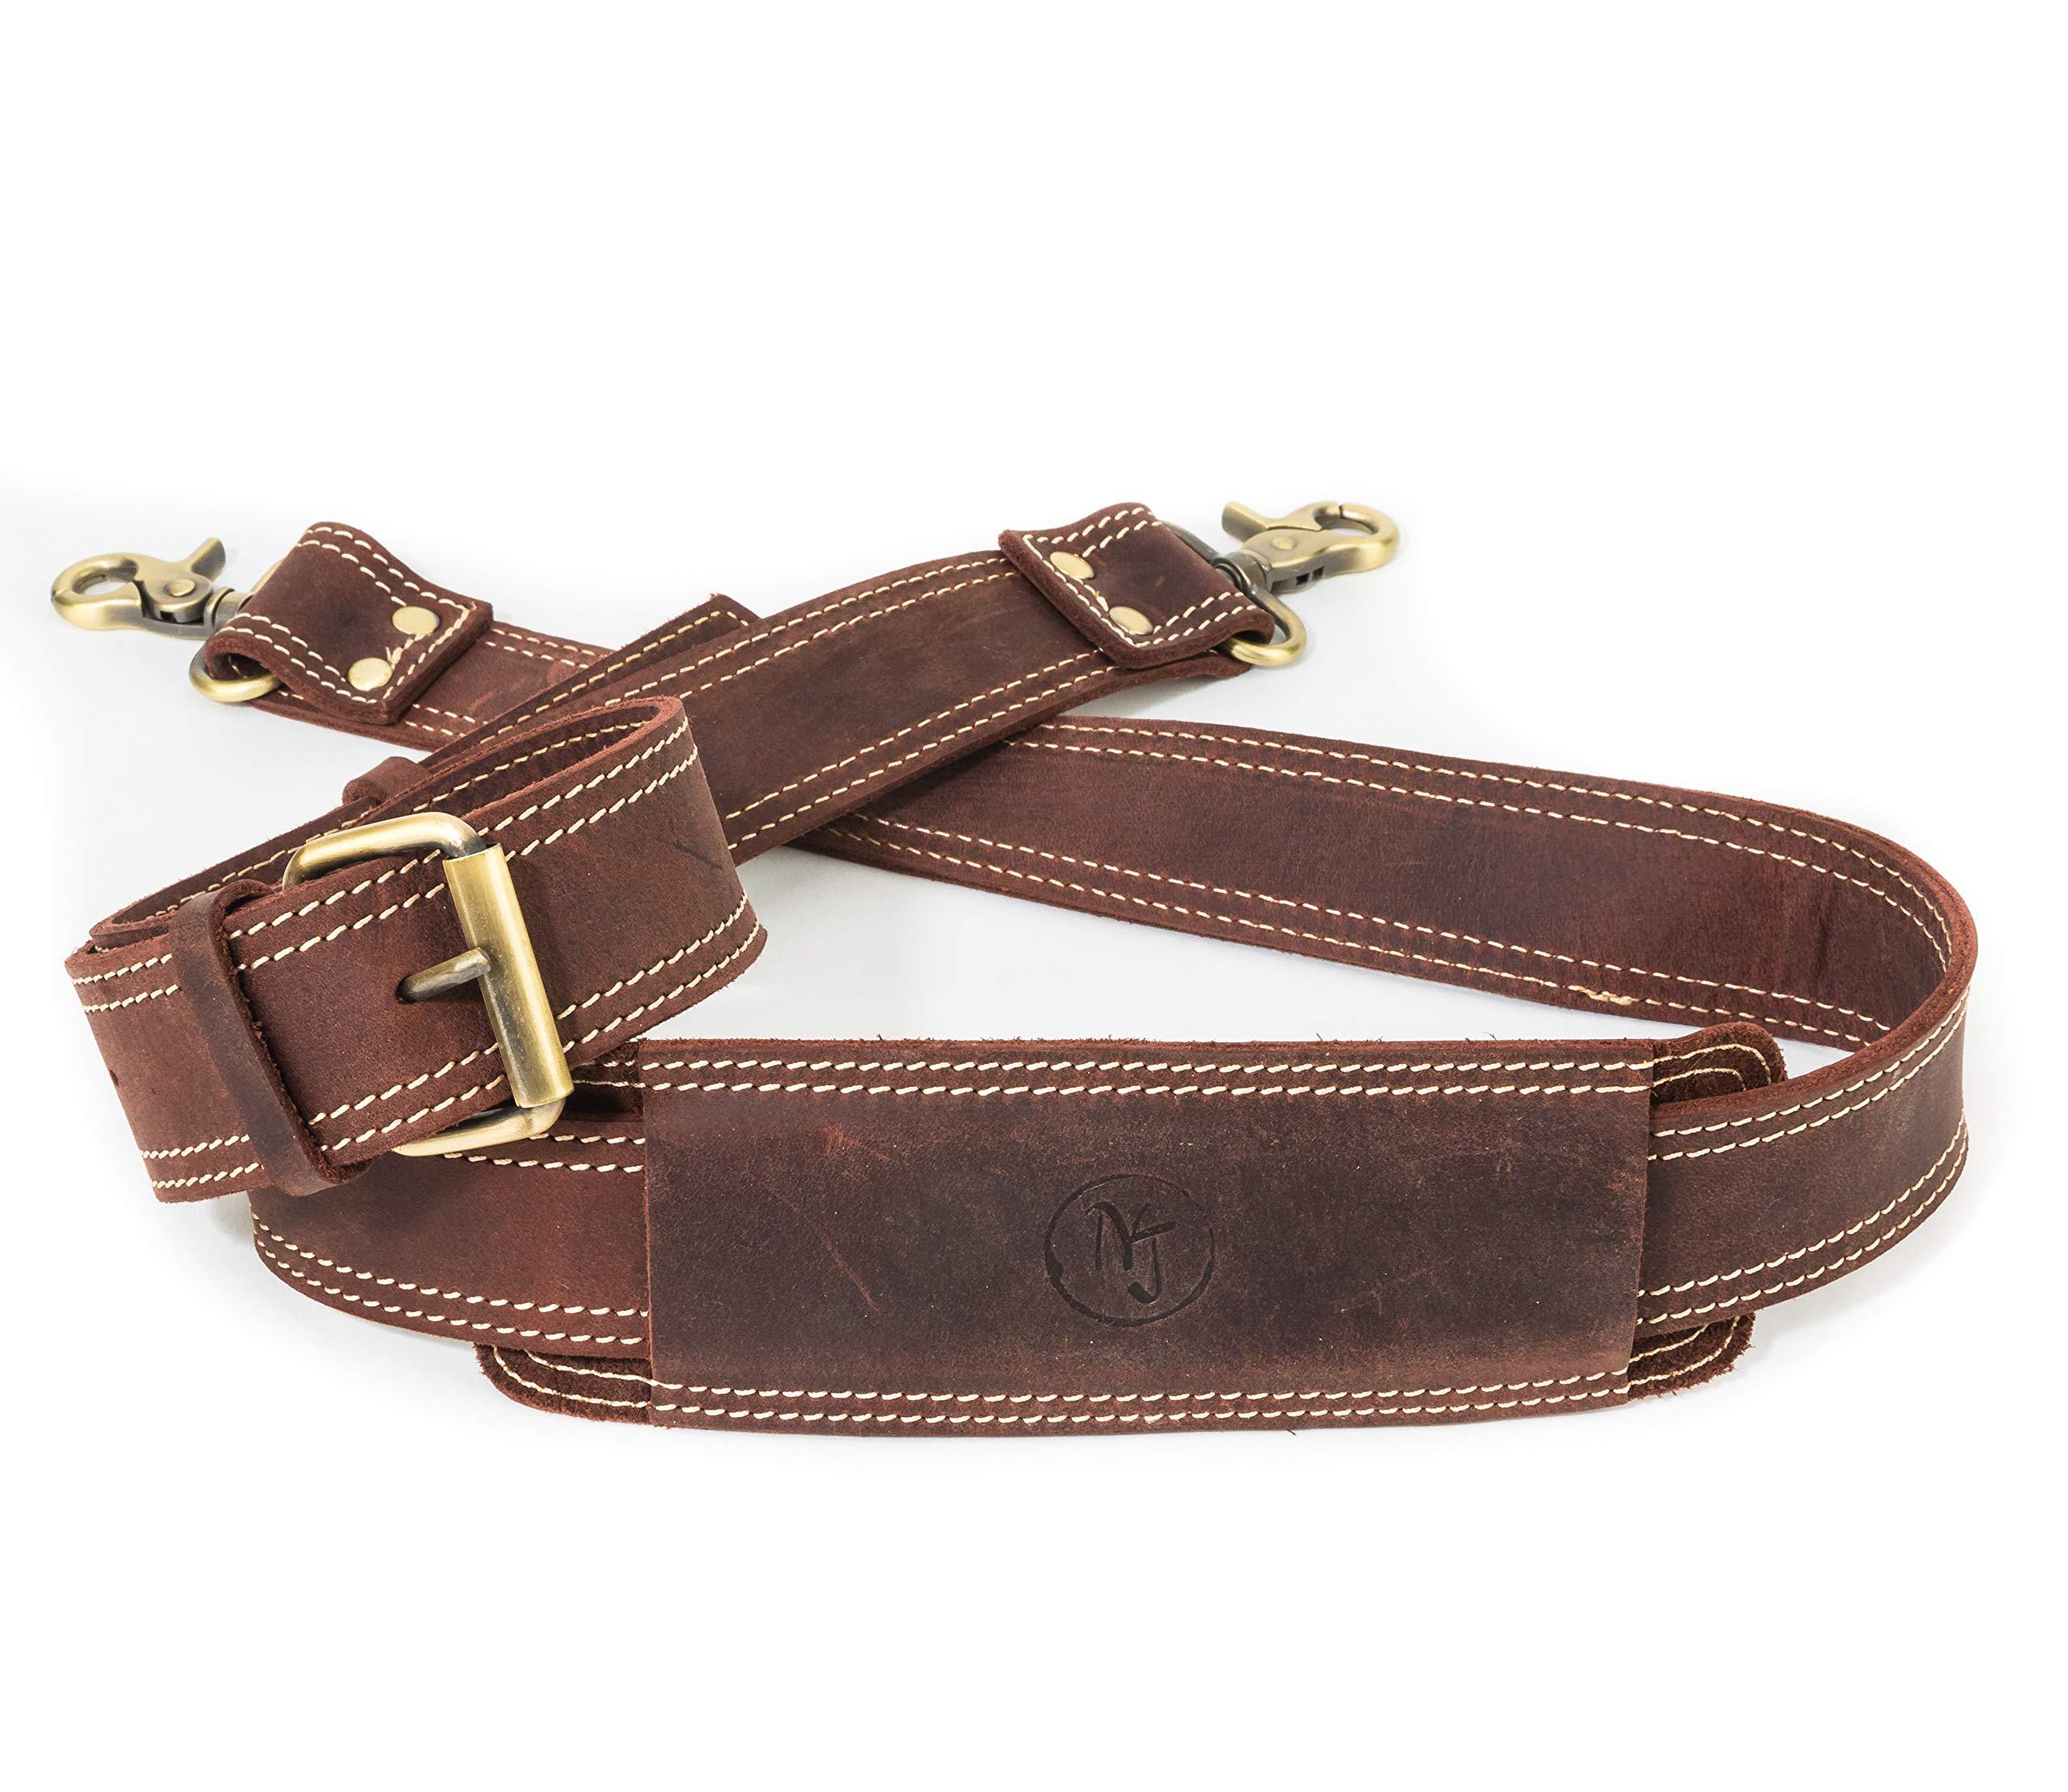 Messenger Bag Strap Replacement - Quality Genuine Cowhide Leather Adjustable Shoulder Strap; for Messenger, Laptop, Camera, Travel Bags and More (Dark Brown)